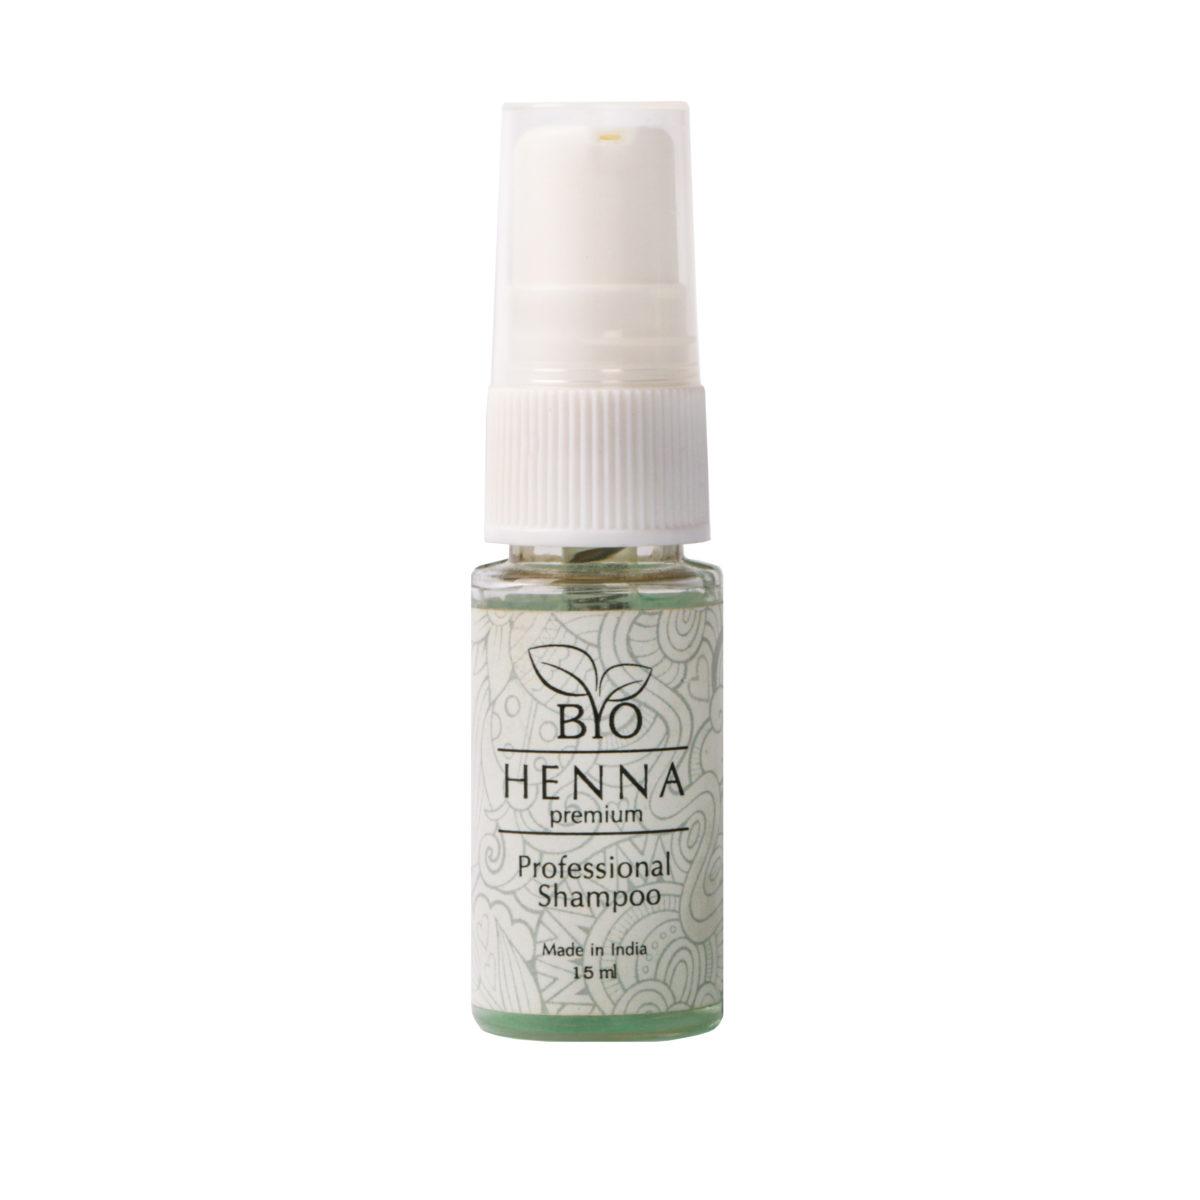 Bio Henna Premium Professional Shampoo 15 ml Henna pudrowa